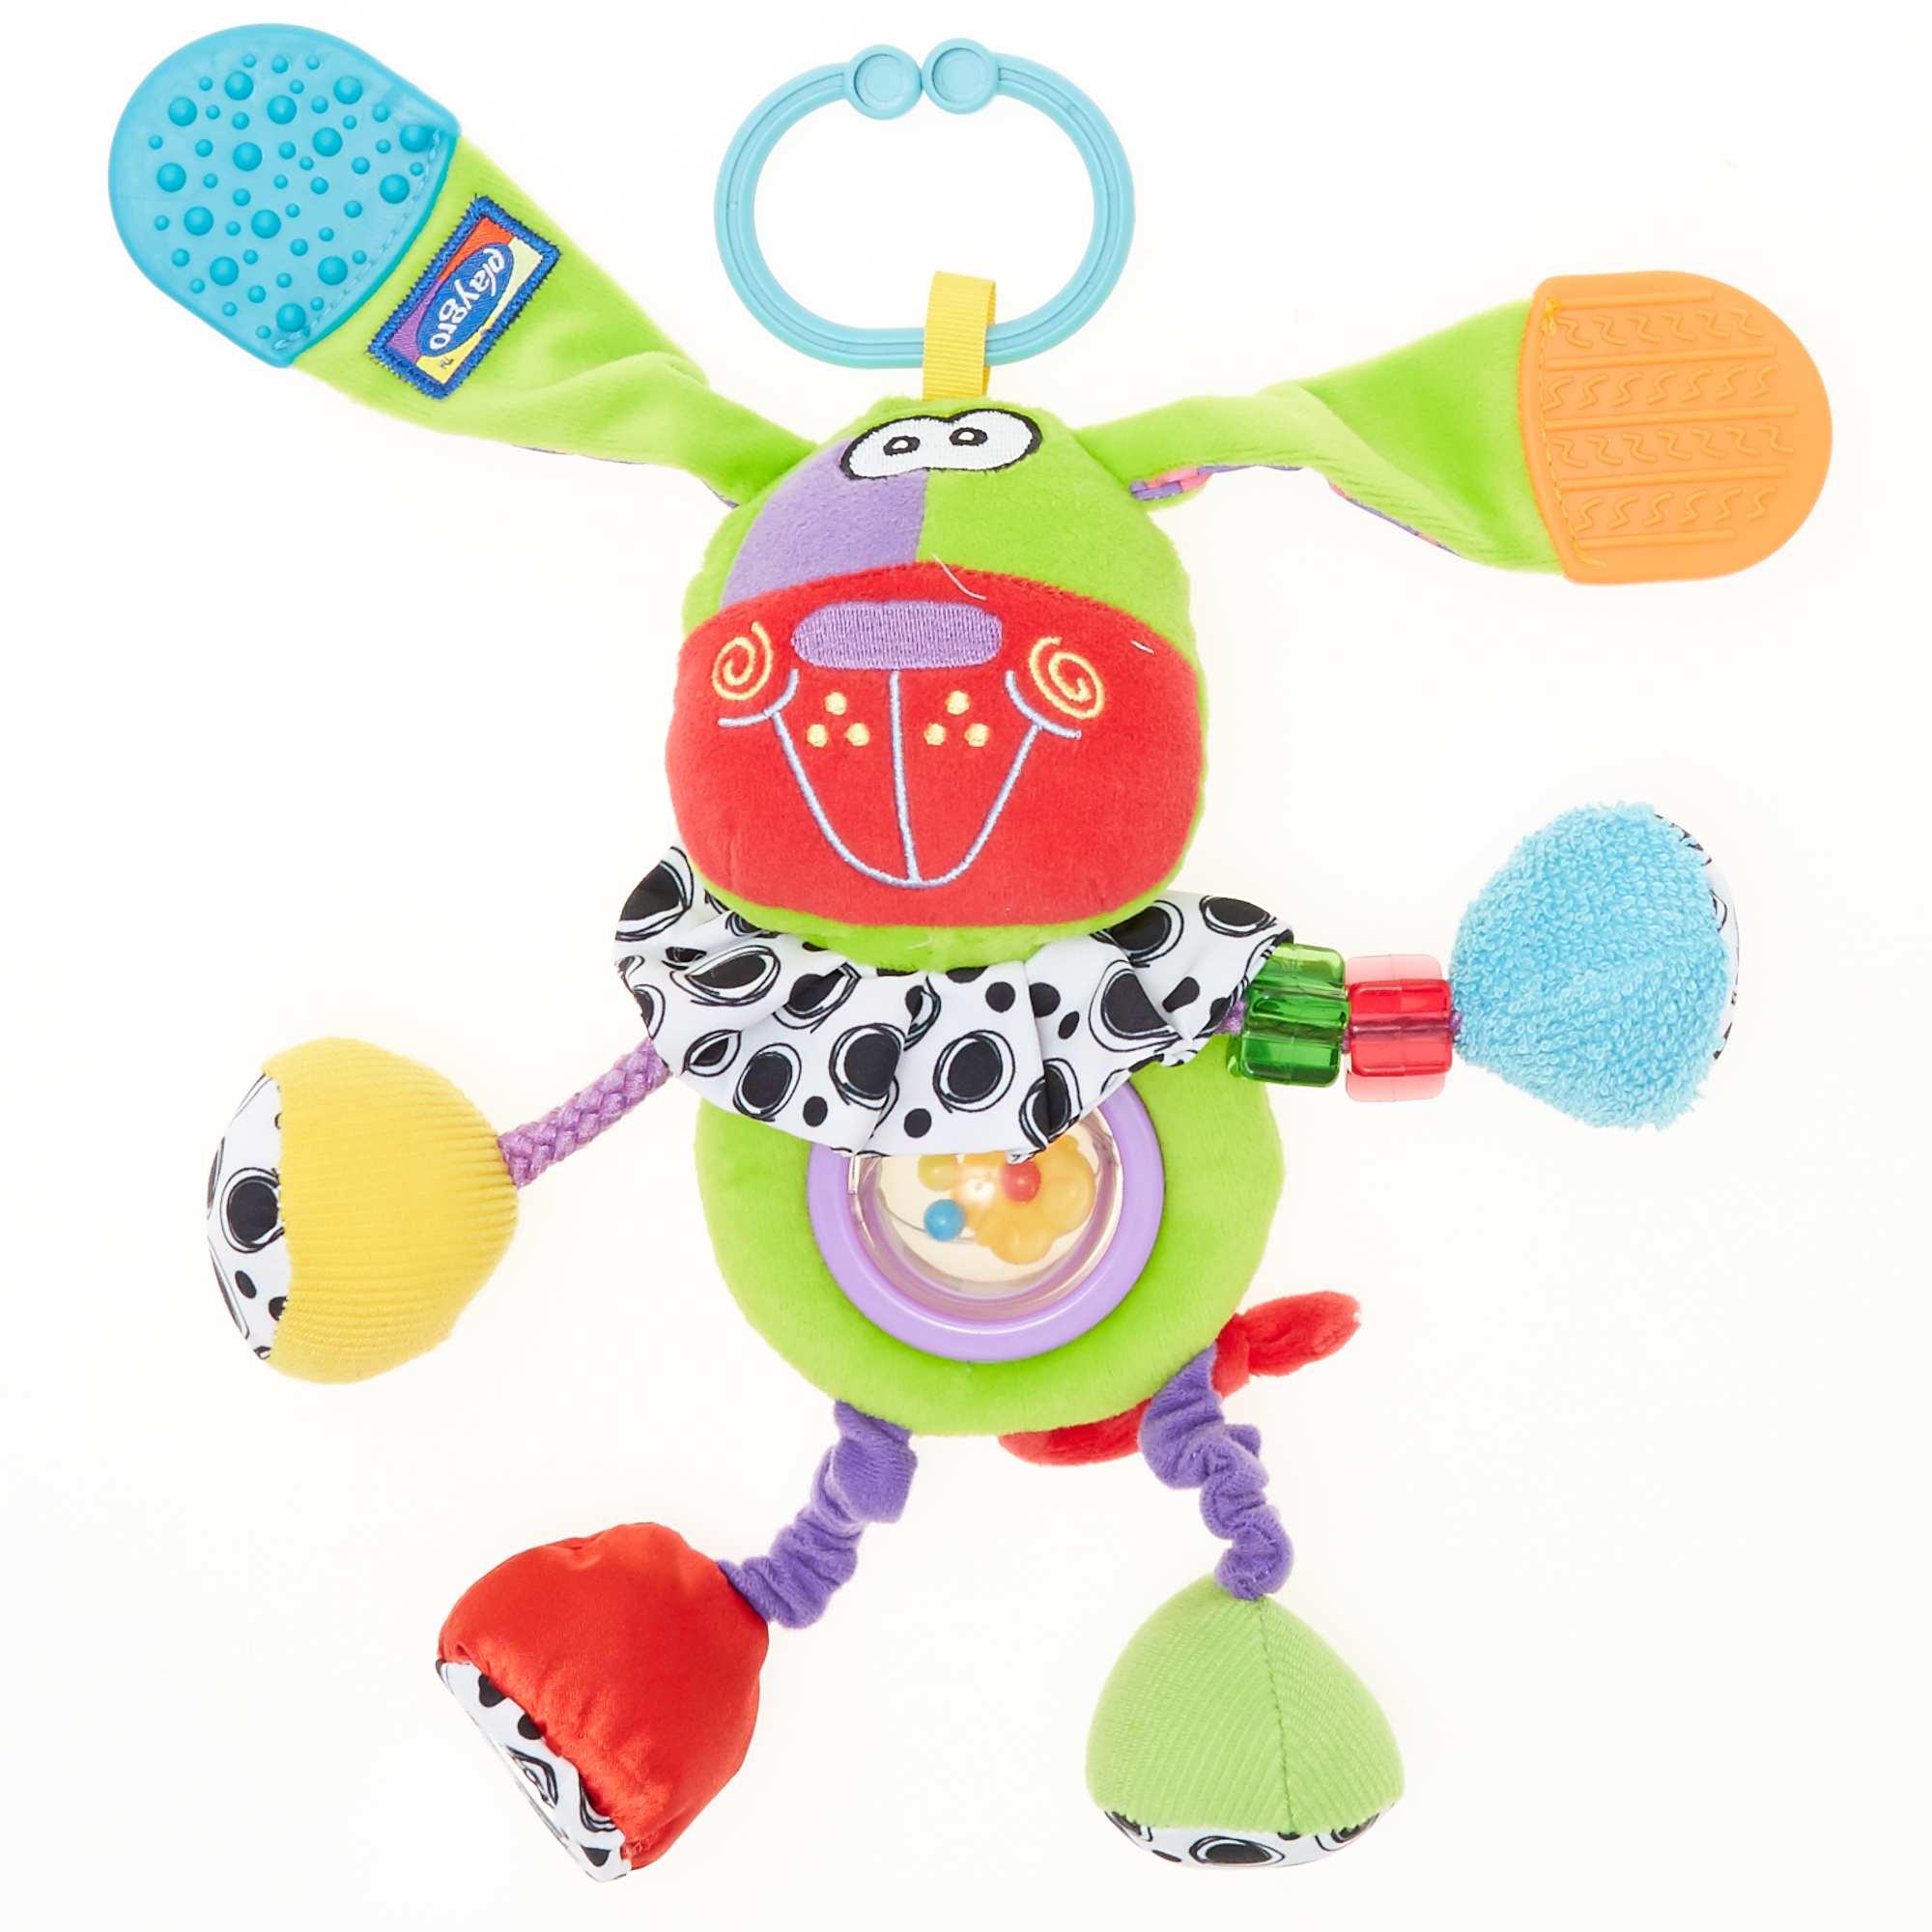 Babyspeelgoed Hond Jongens Babykleding Wit Kiabi 1000